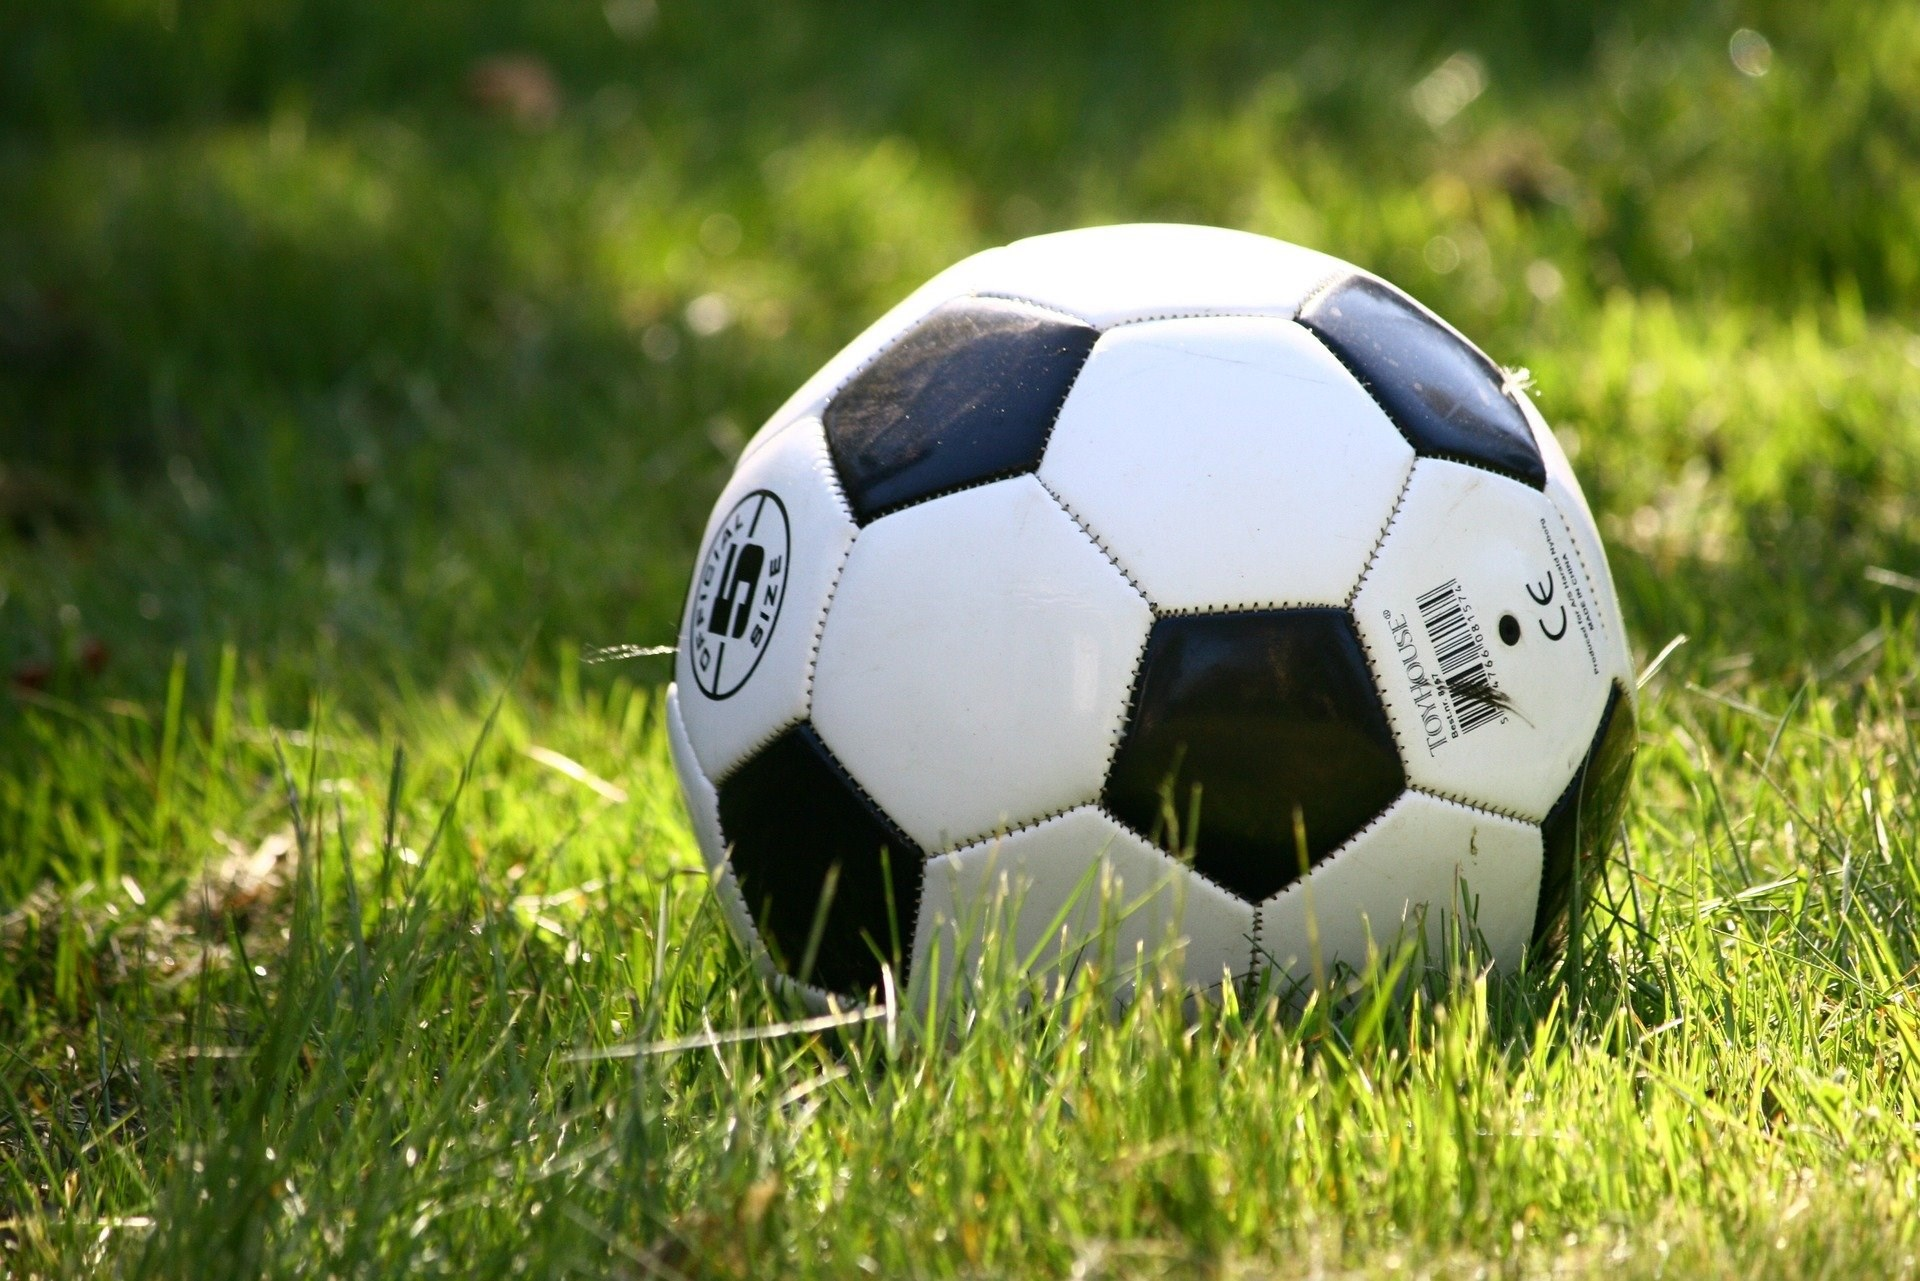 Coventry City v Fulham (Football League)